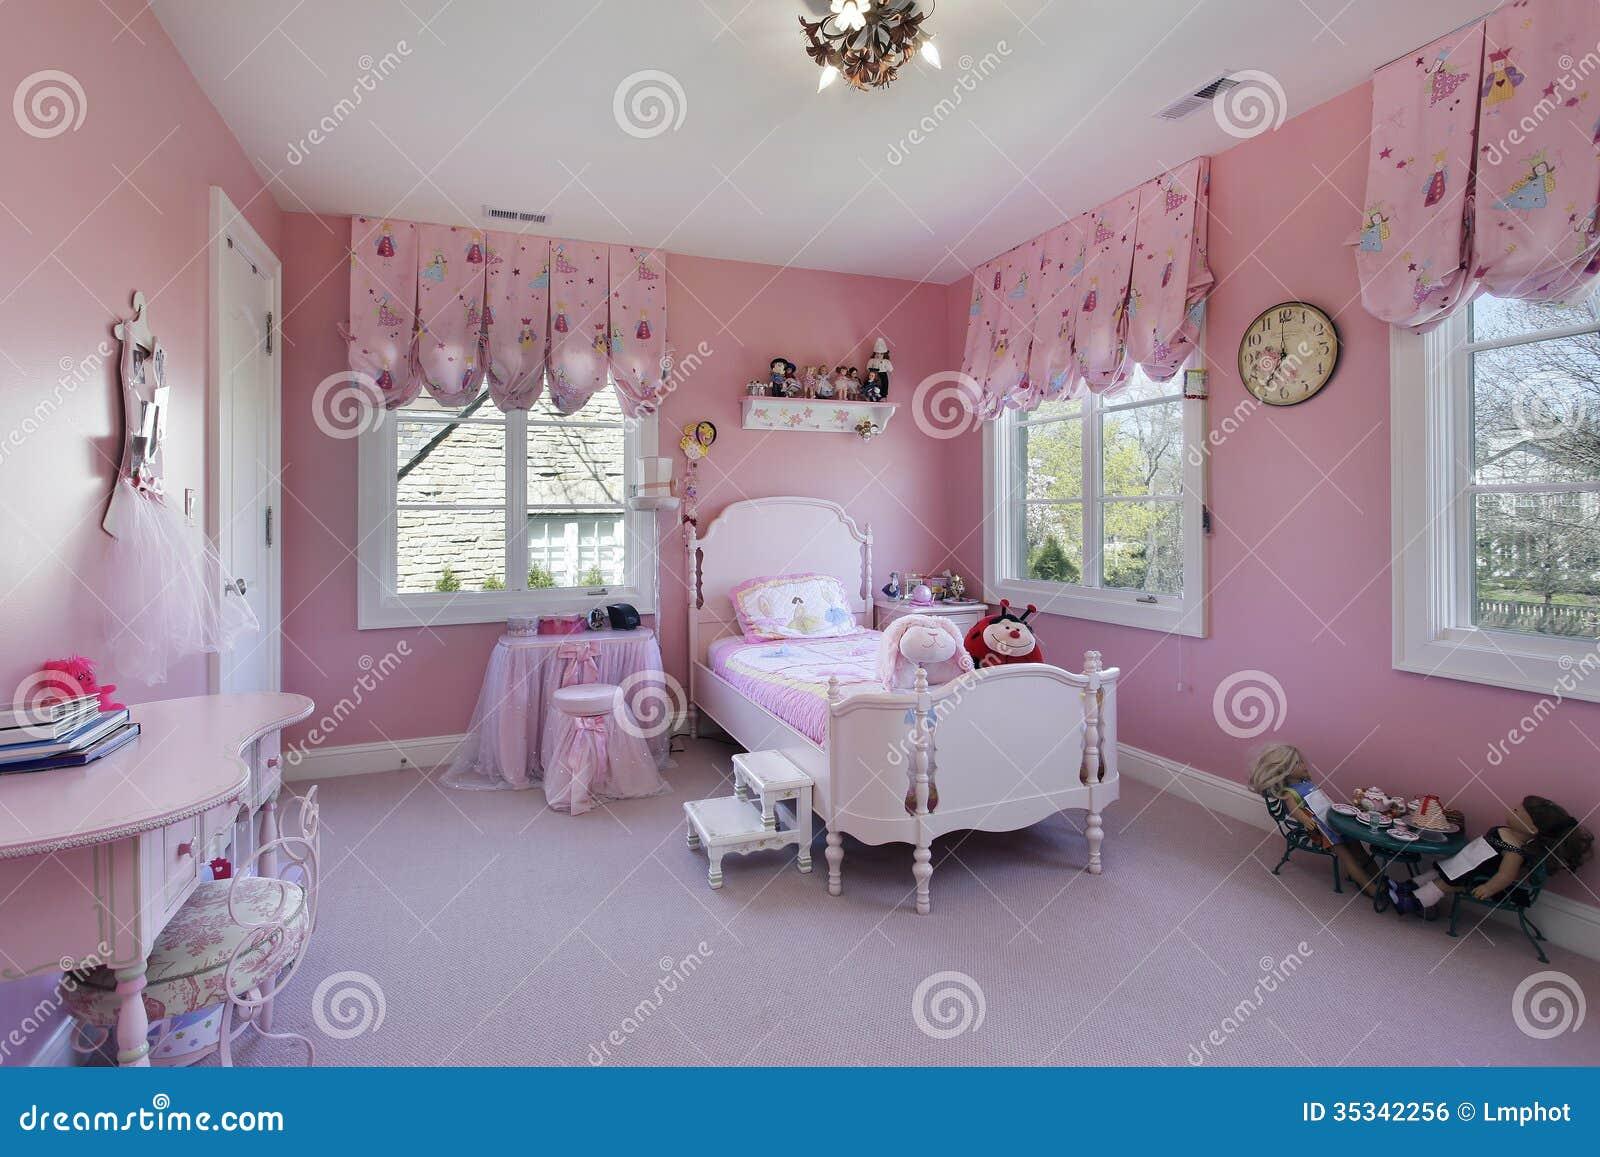 home room .